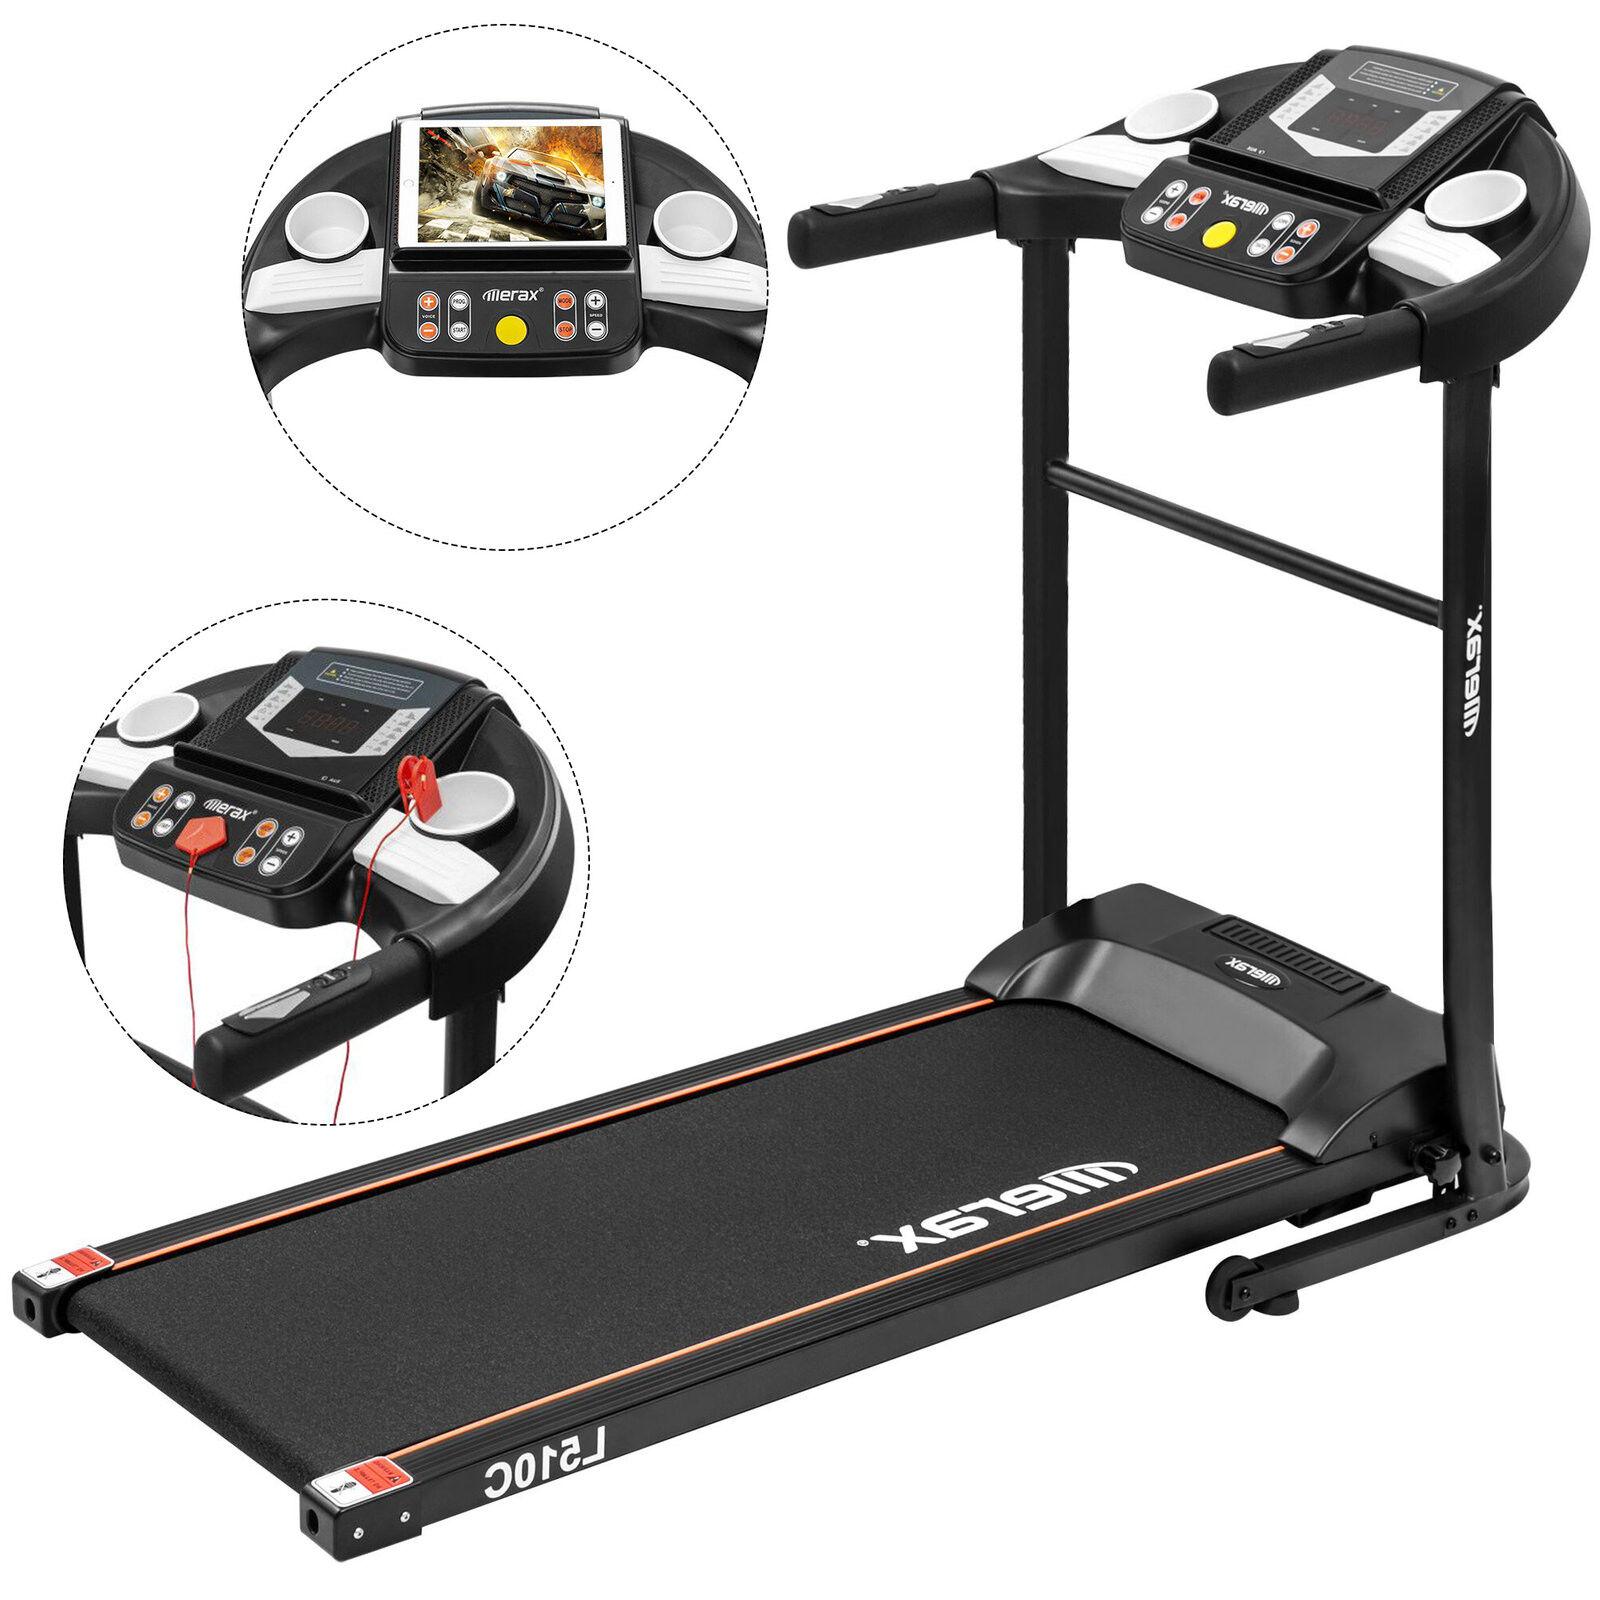 e515d94caa2 Merax 1.5HP Folding Electric Motorized Treadmill - MS039013 for sale ...